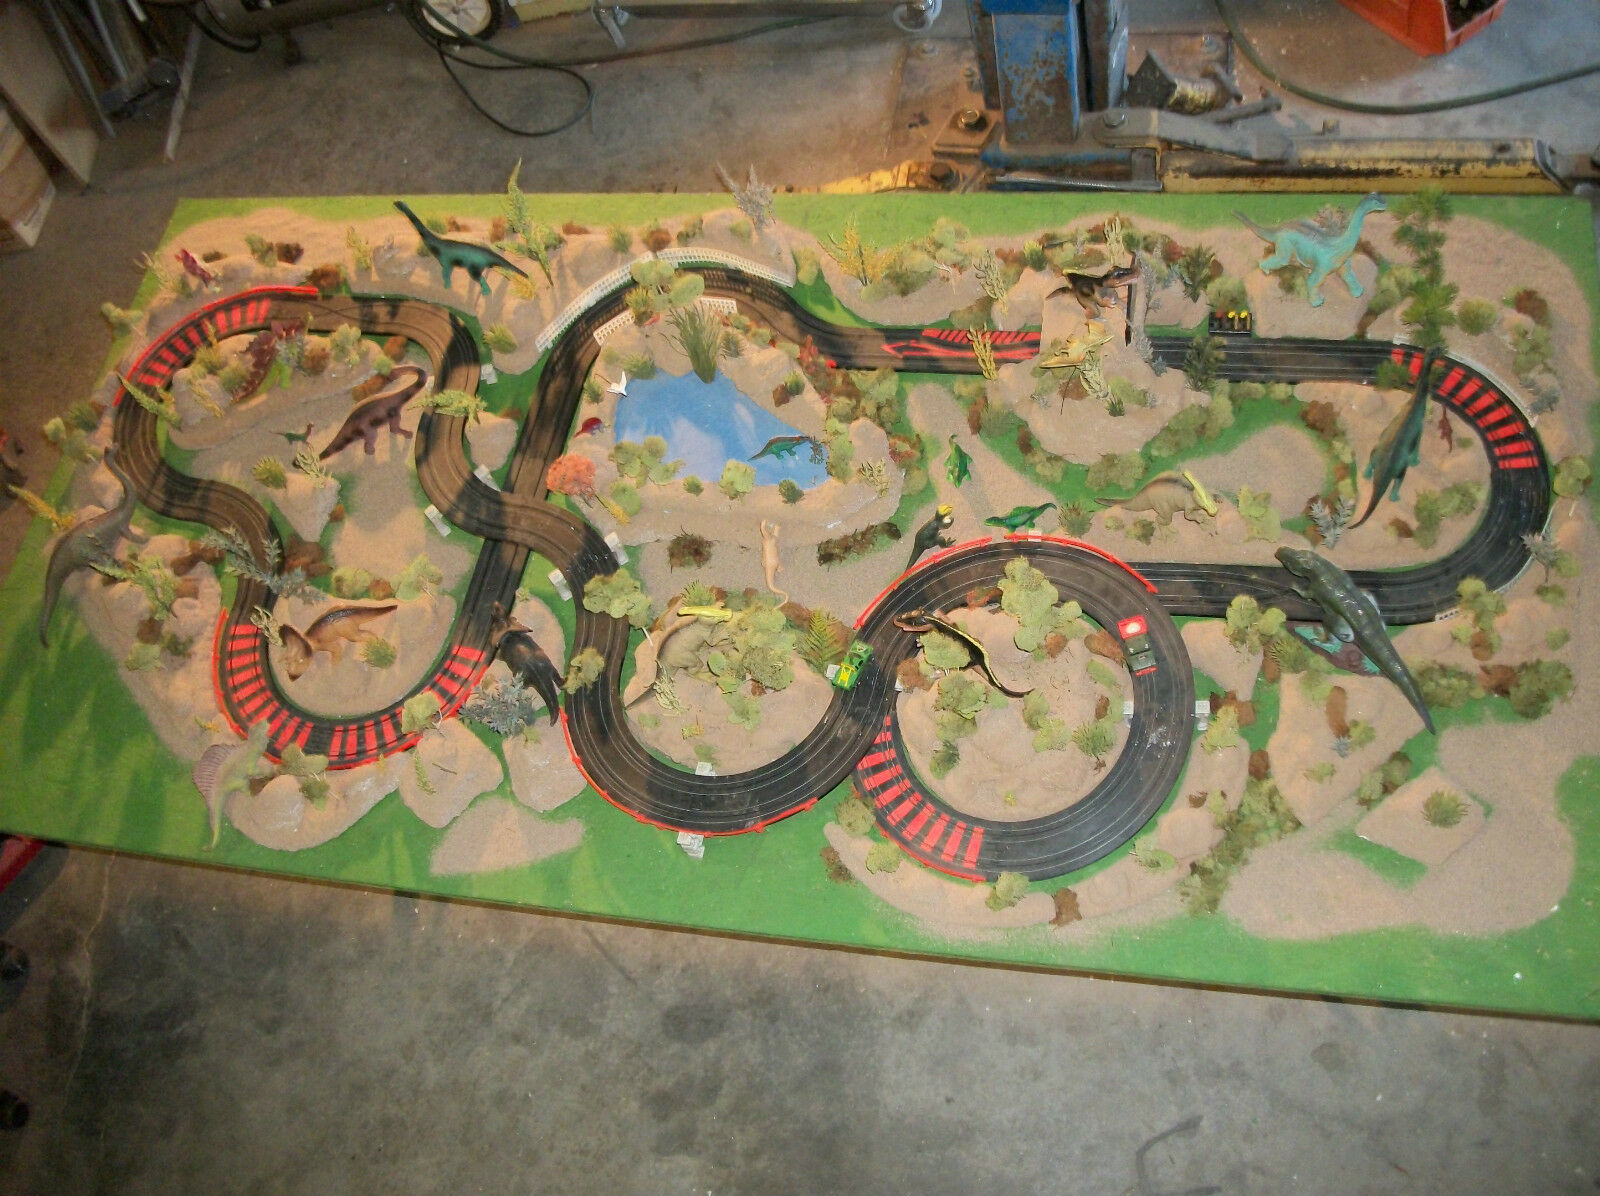 Diseño de ranura de coche Jurassic Park